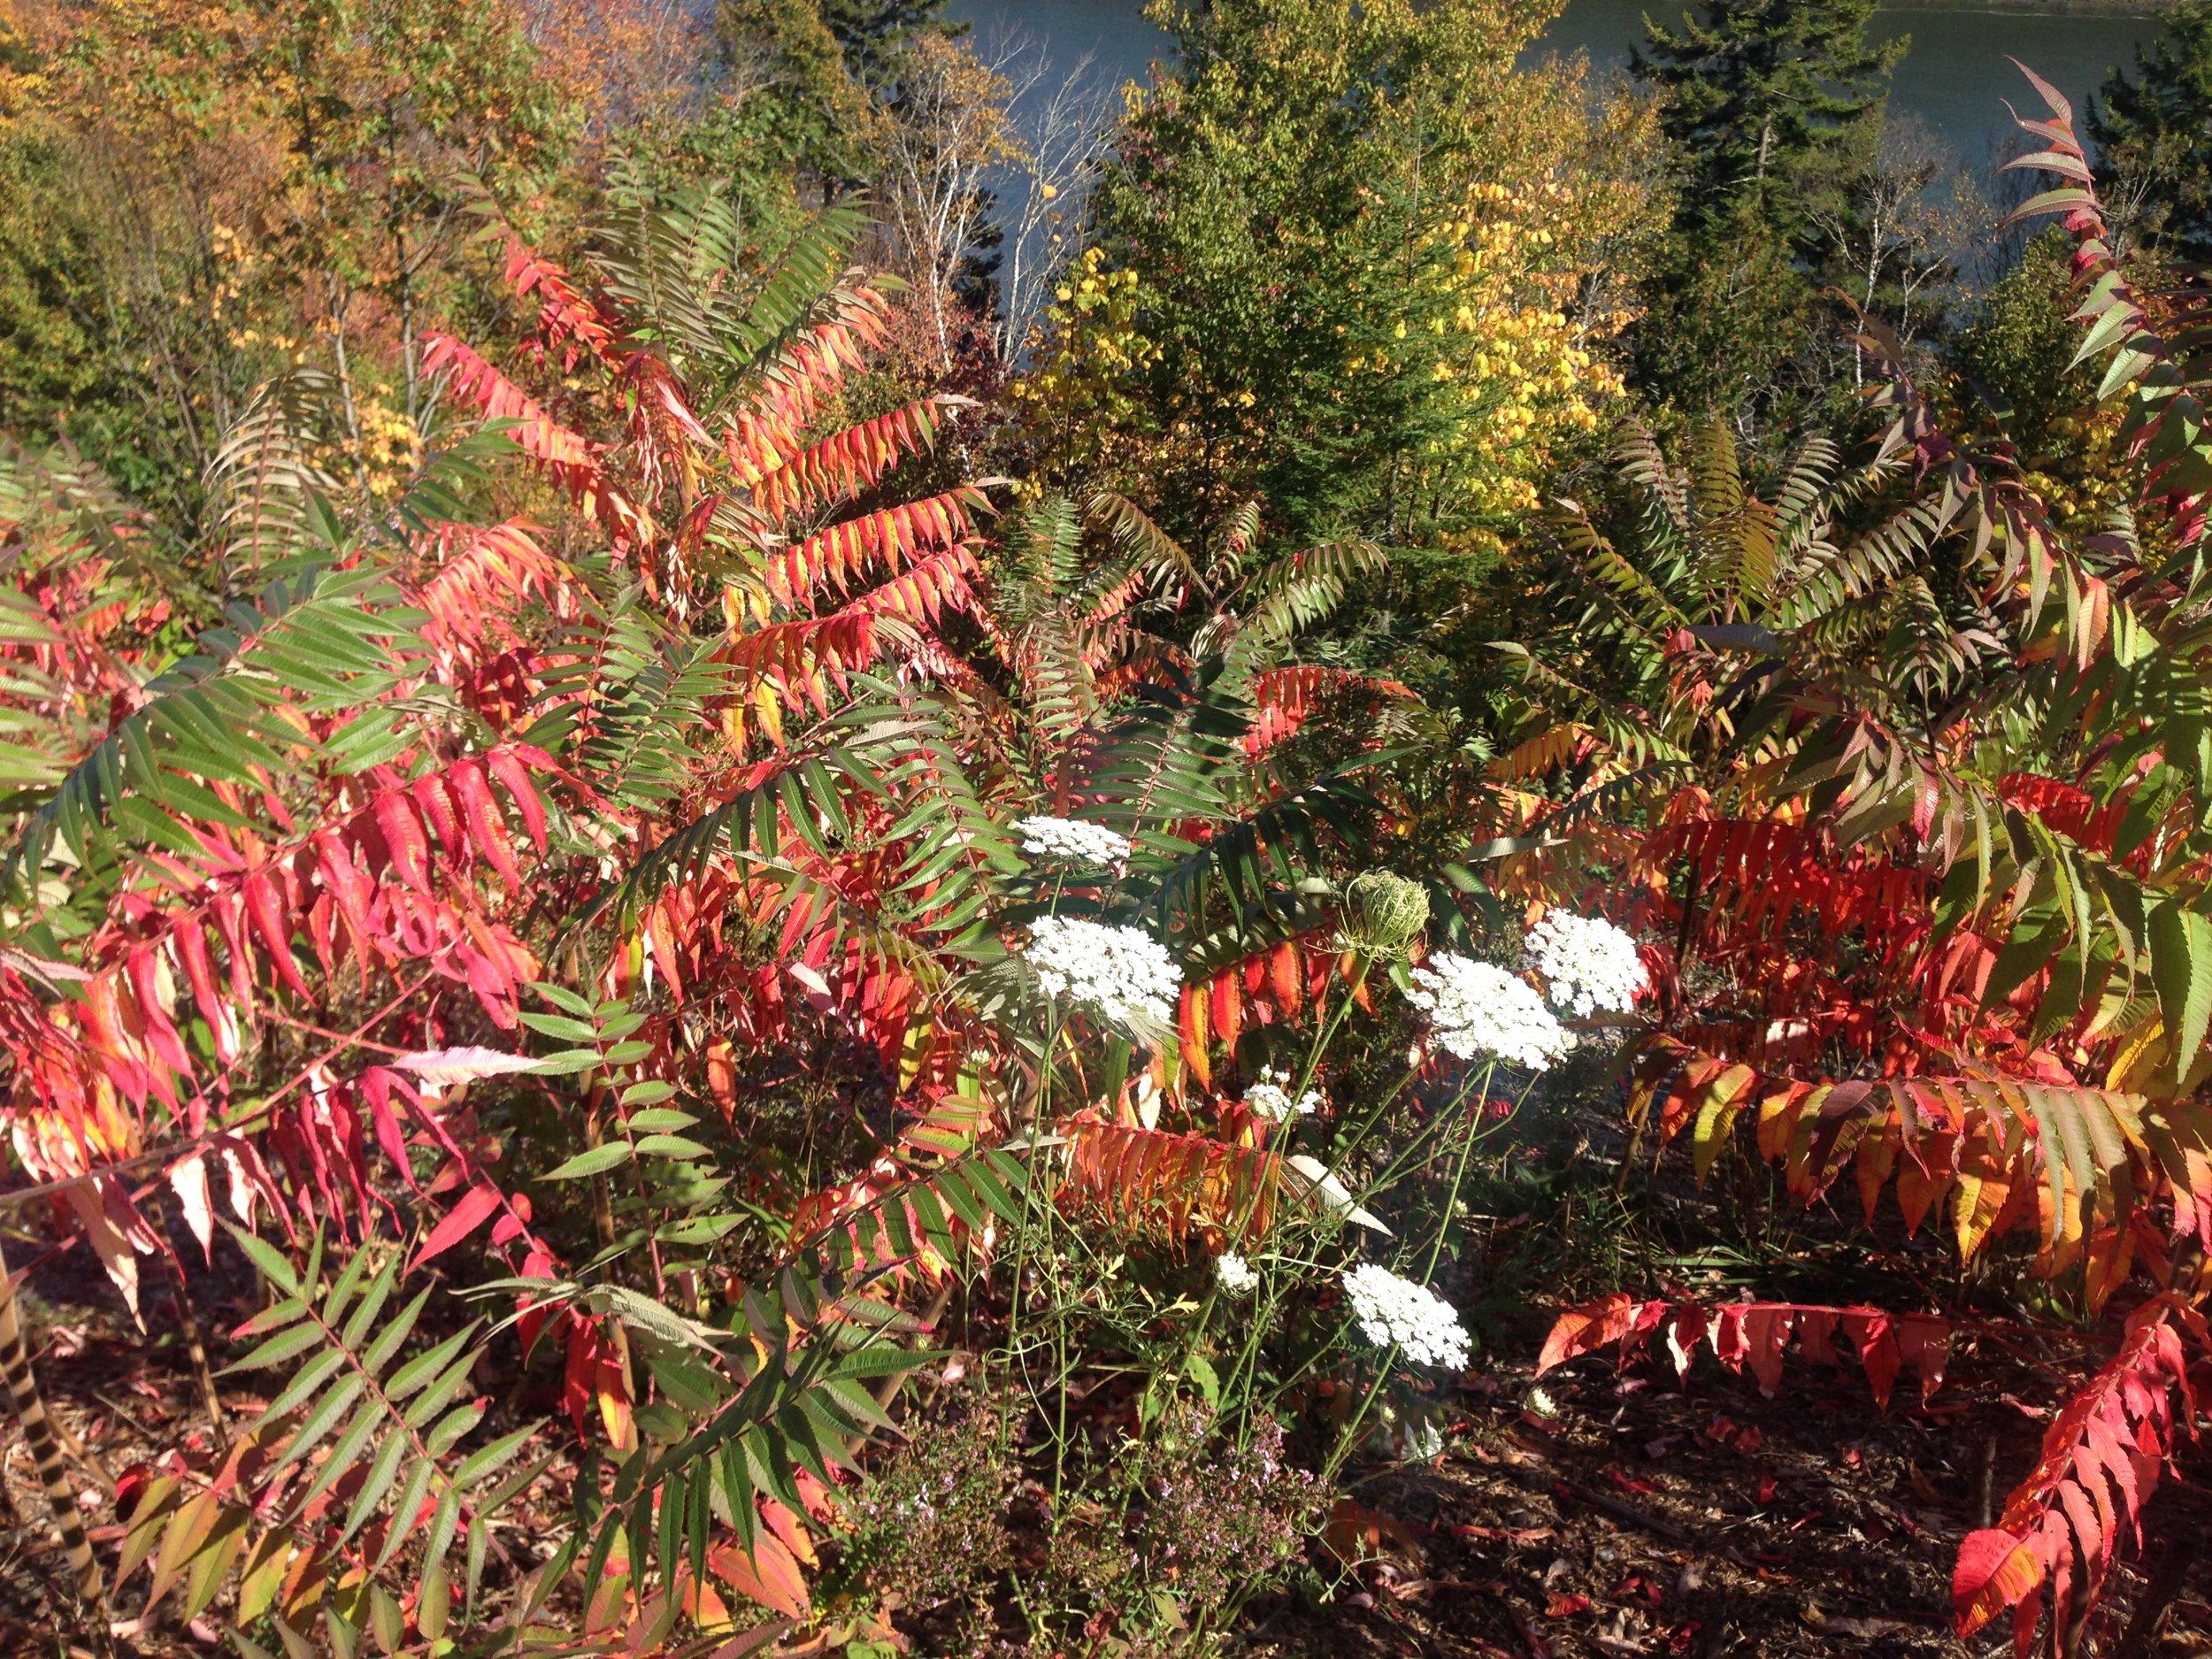 White yarrow (achillea millefolium) brilliantly displays in a fall setting.